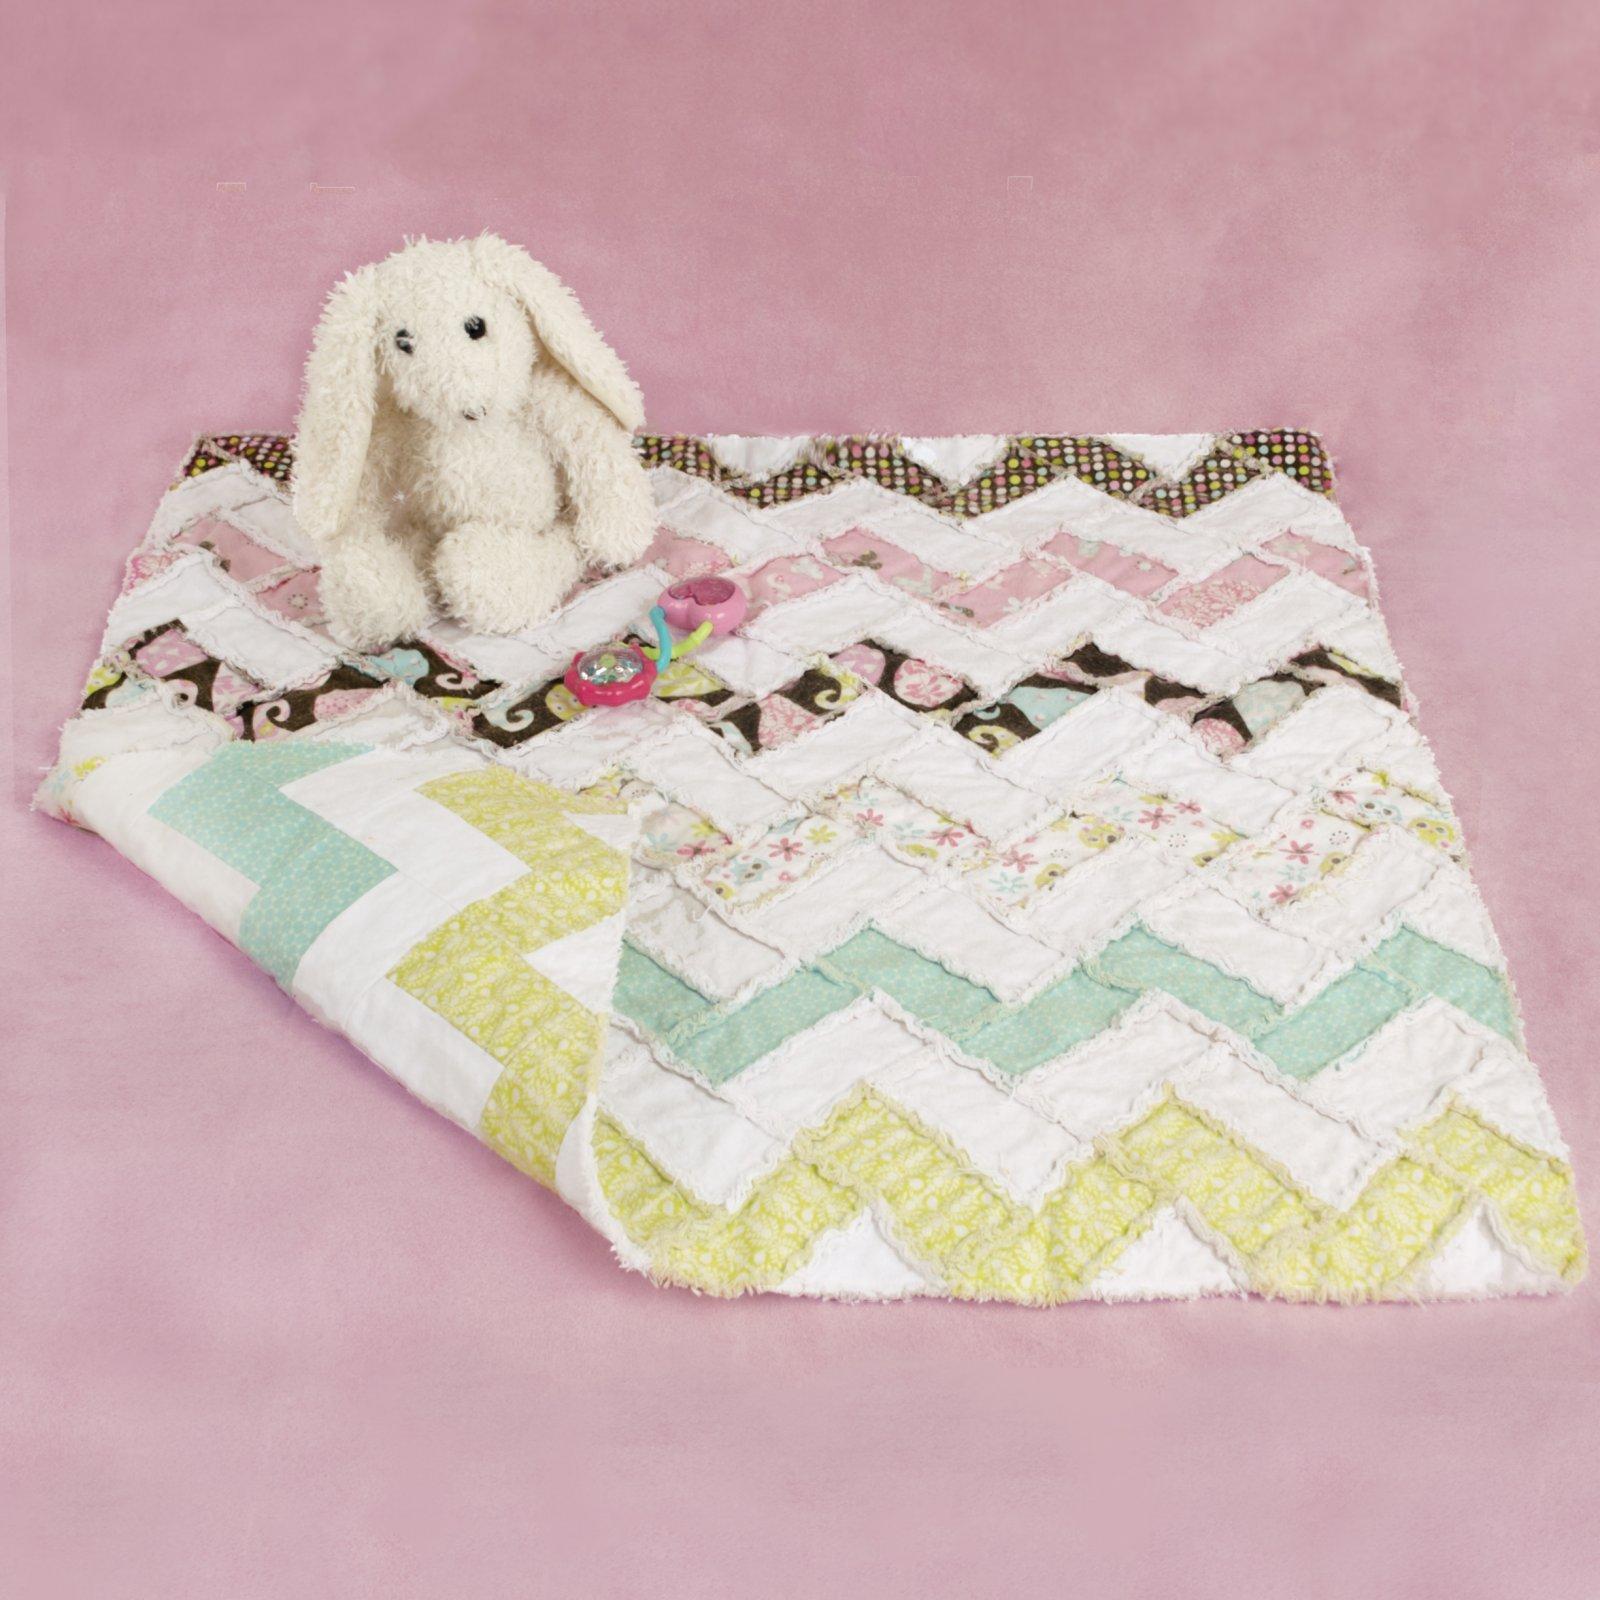 Fuzzy Chevron Blanket